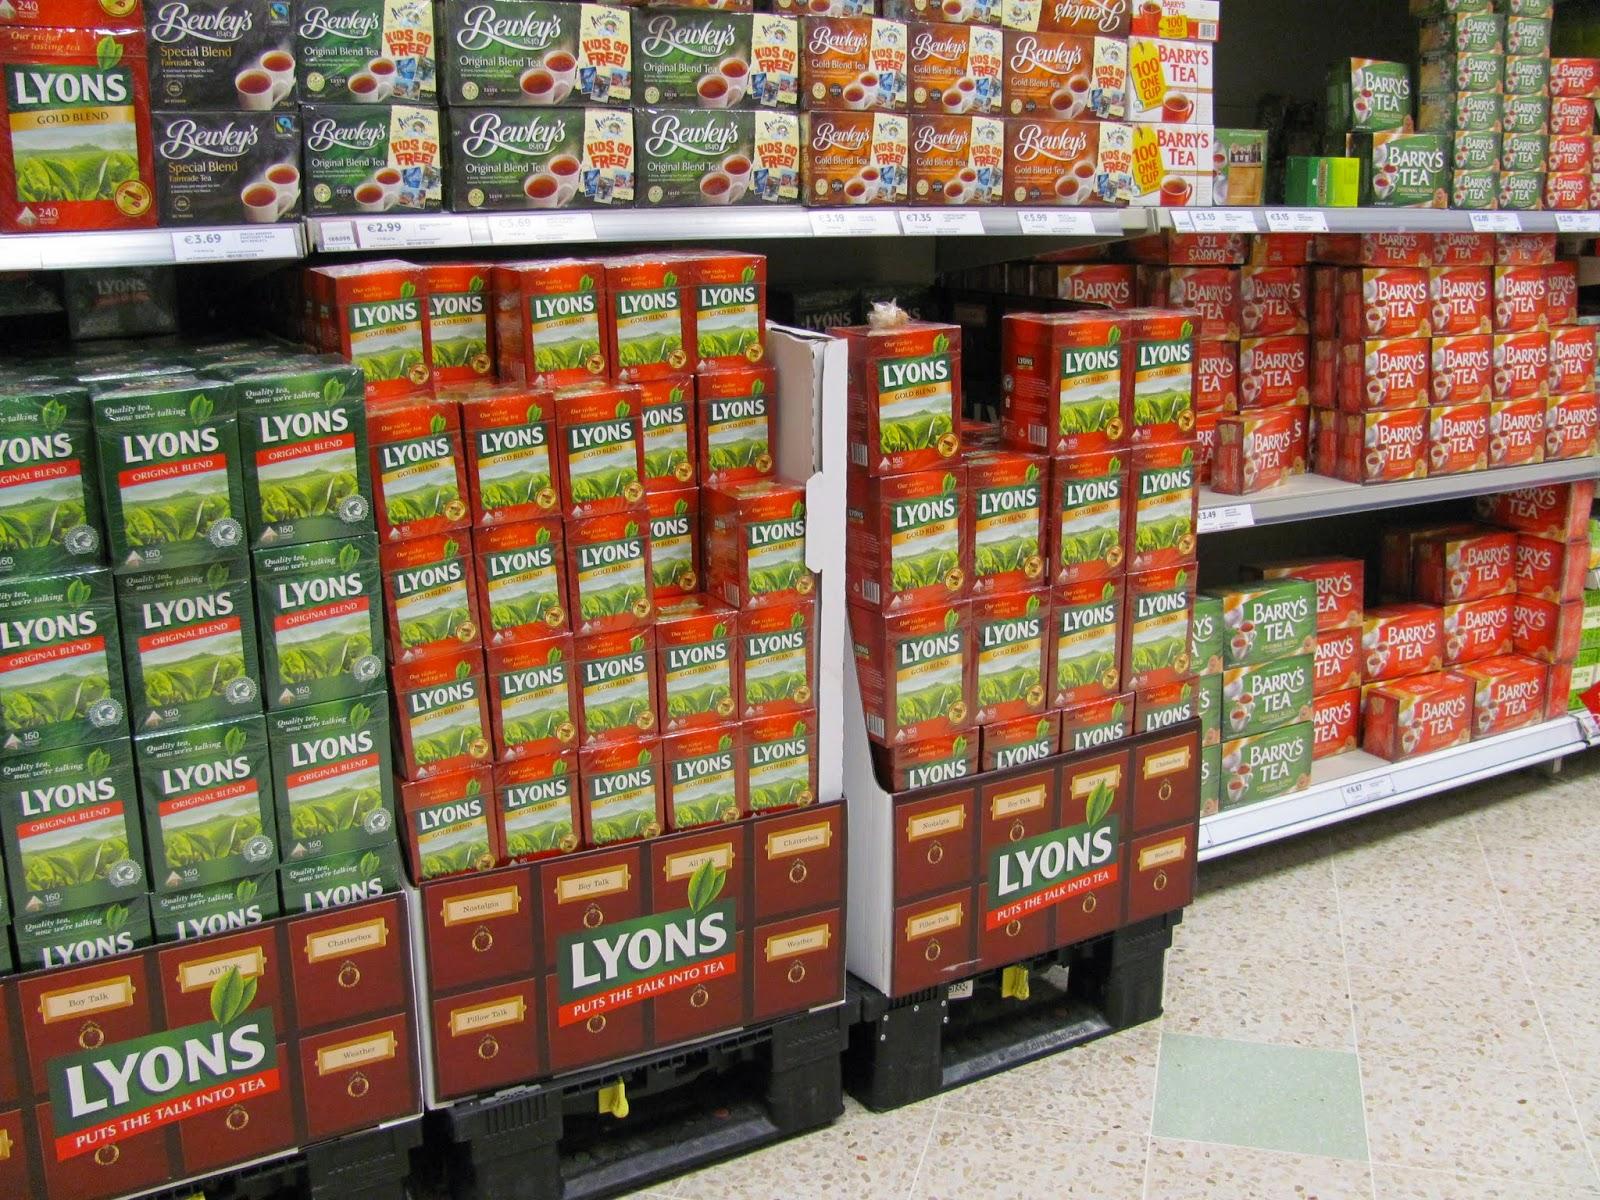 Lyon's and Barry's Tea